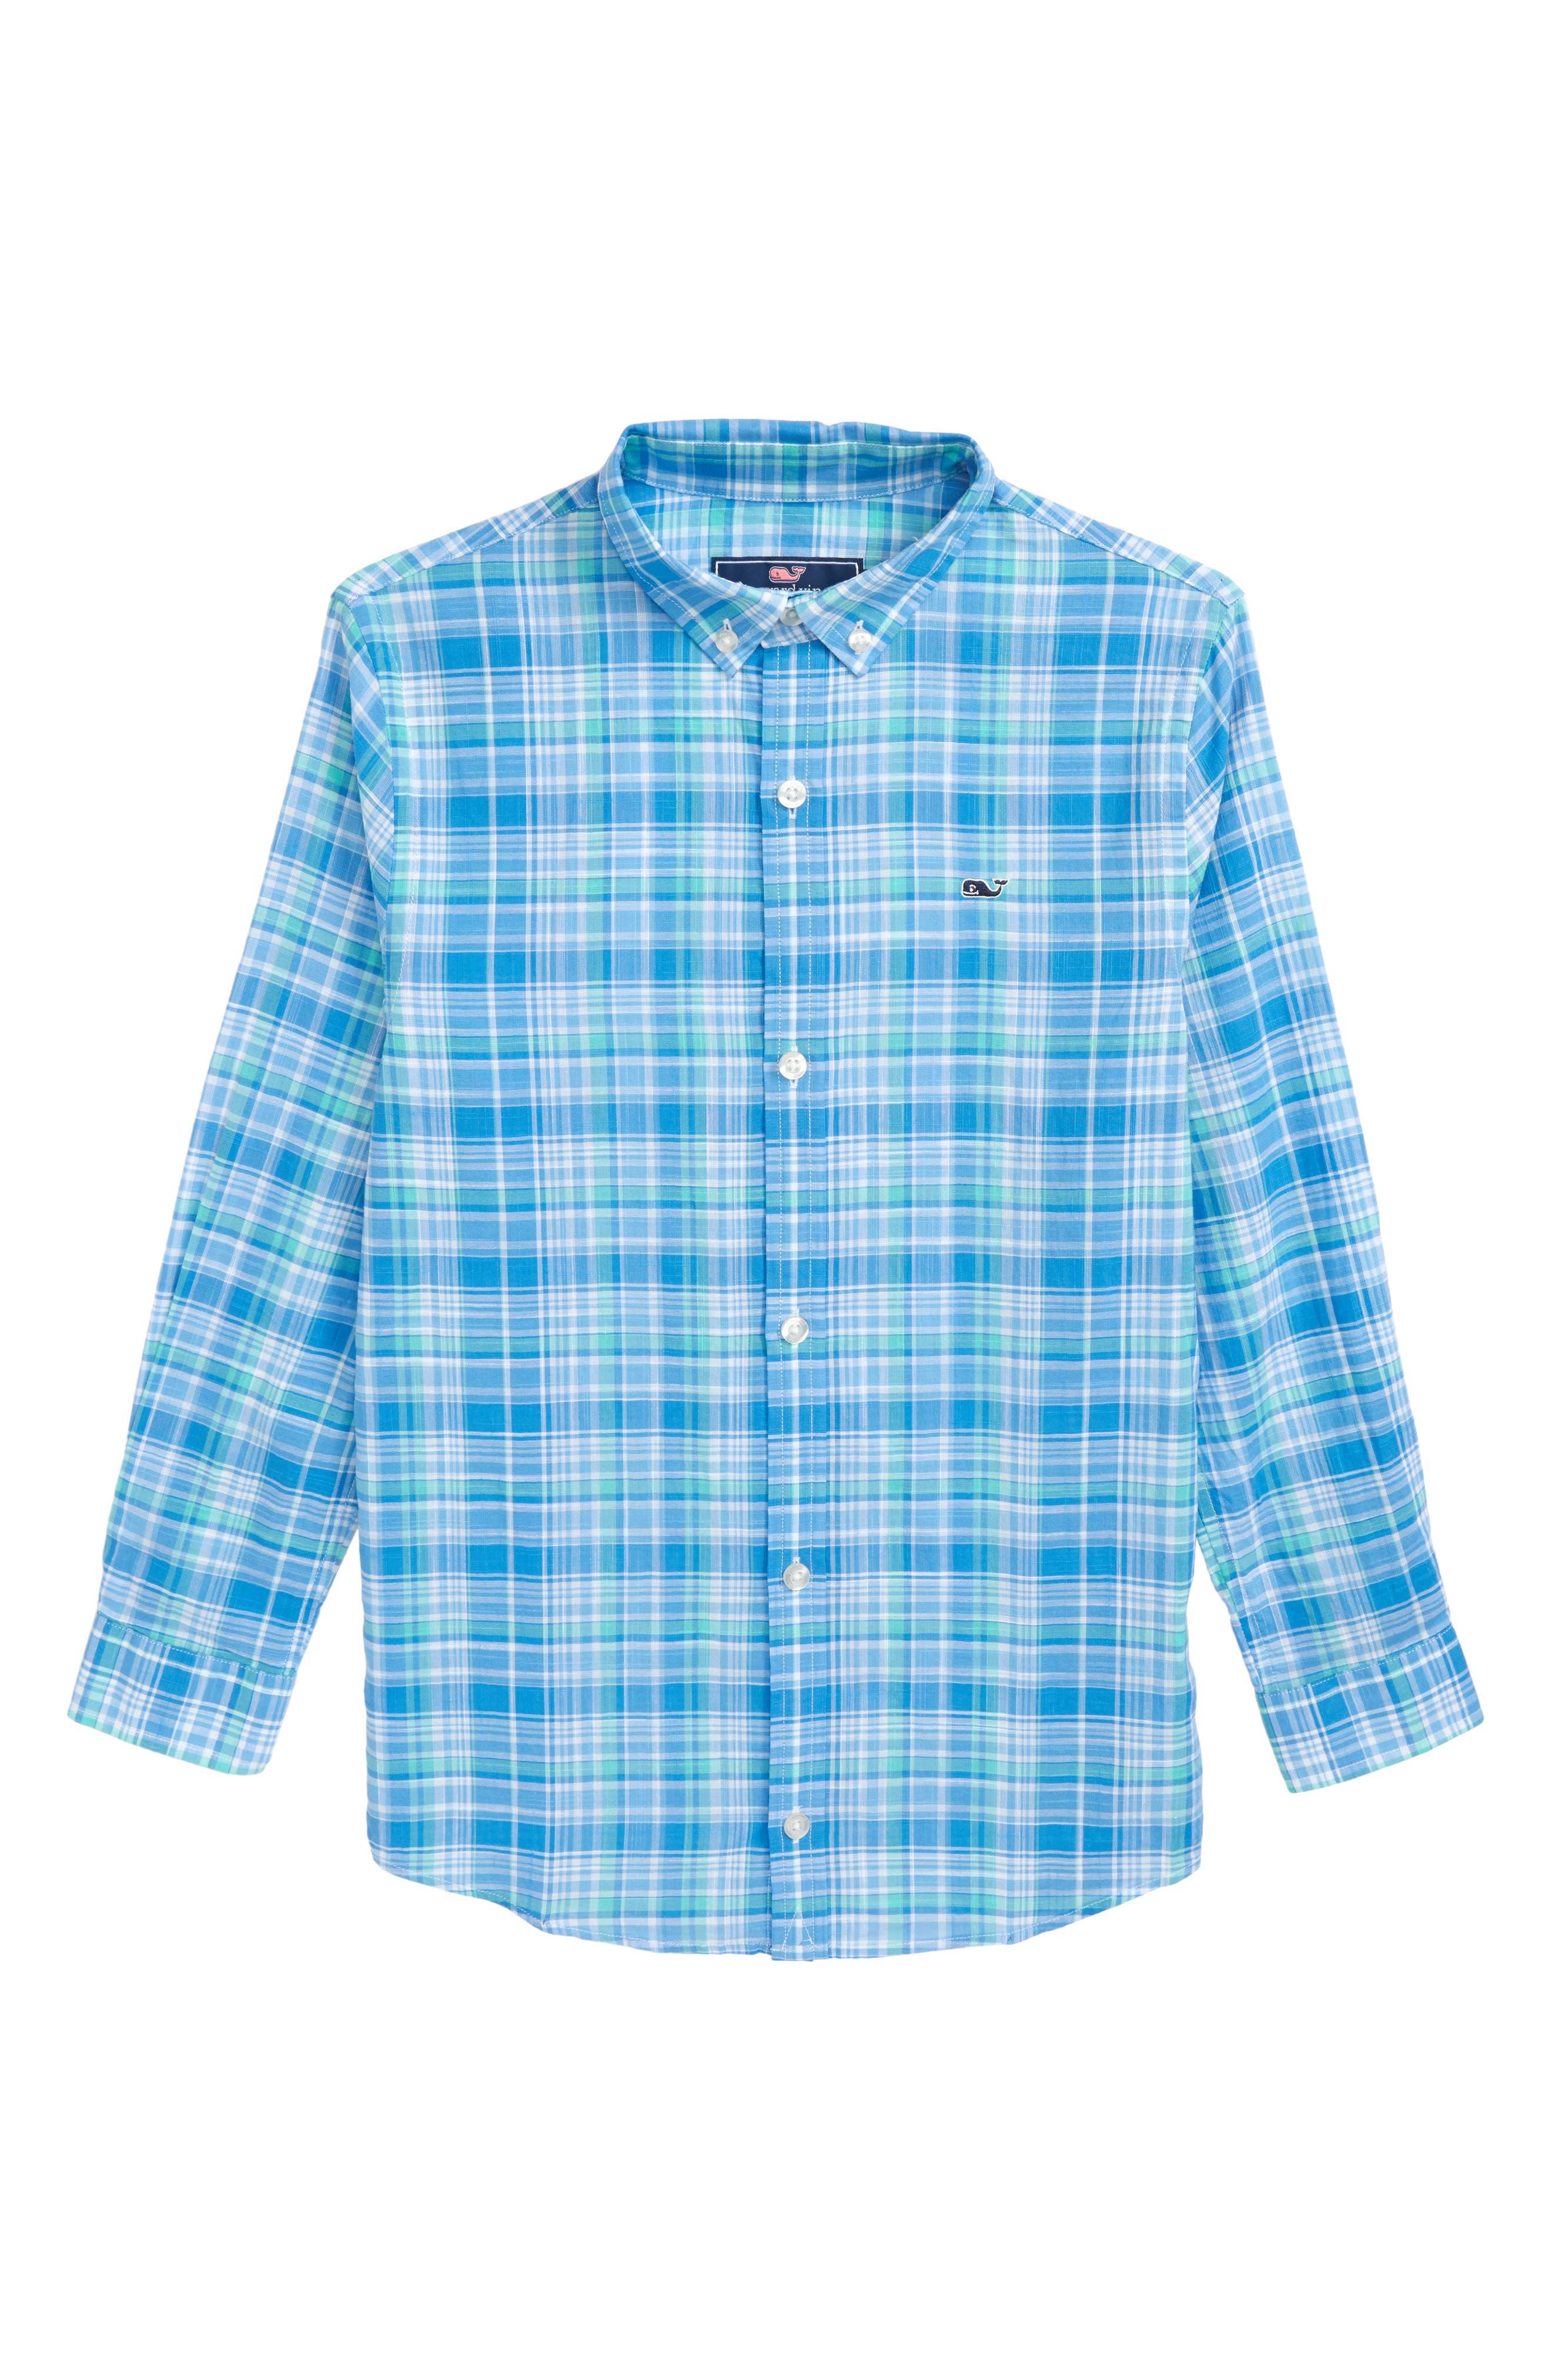 New Providence Beach Plaid Woven Shirt,                             Main thumbnail 1, color,                             Antigua Green